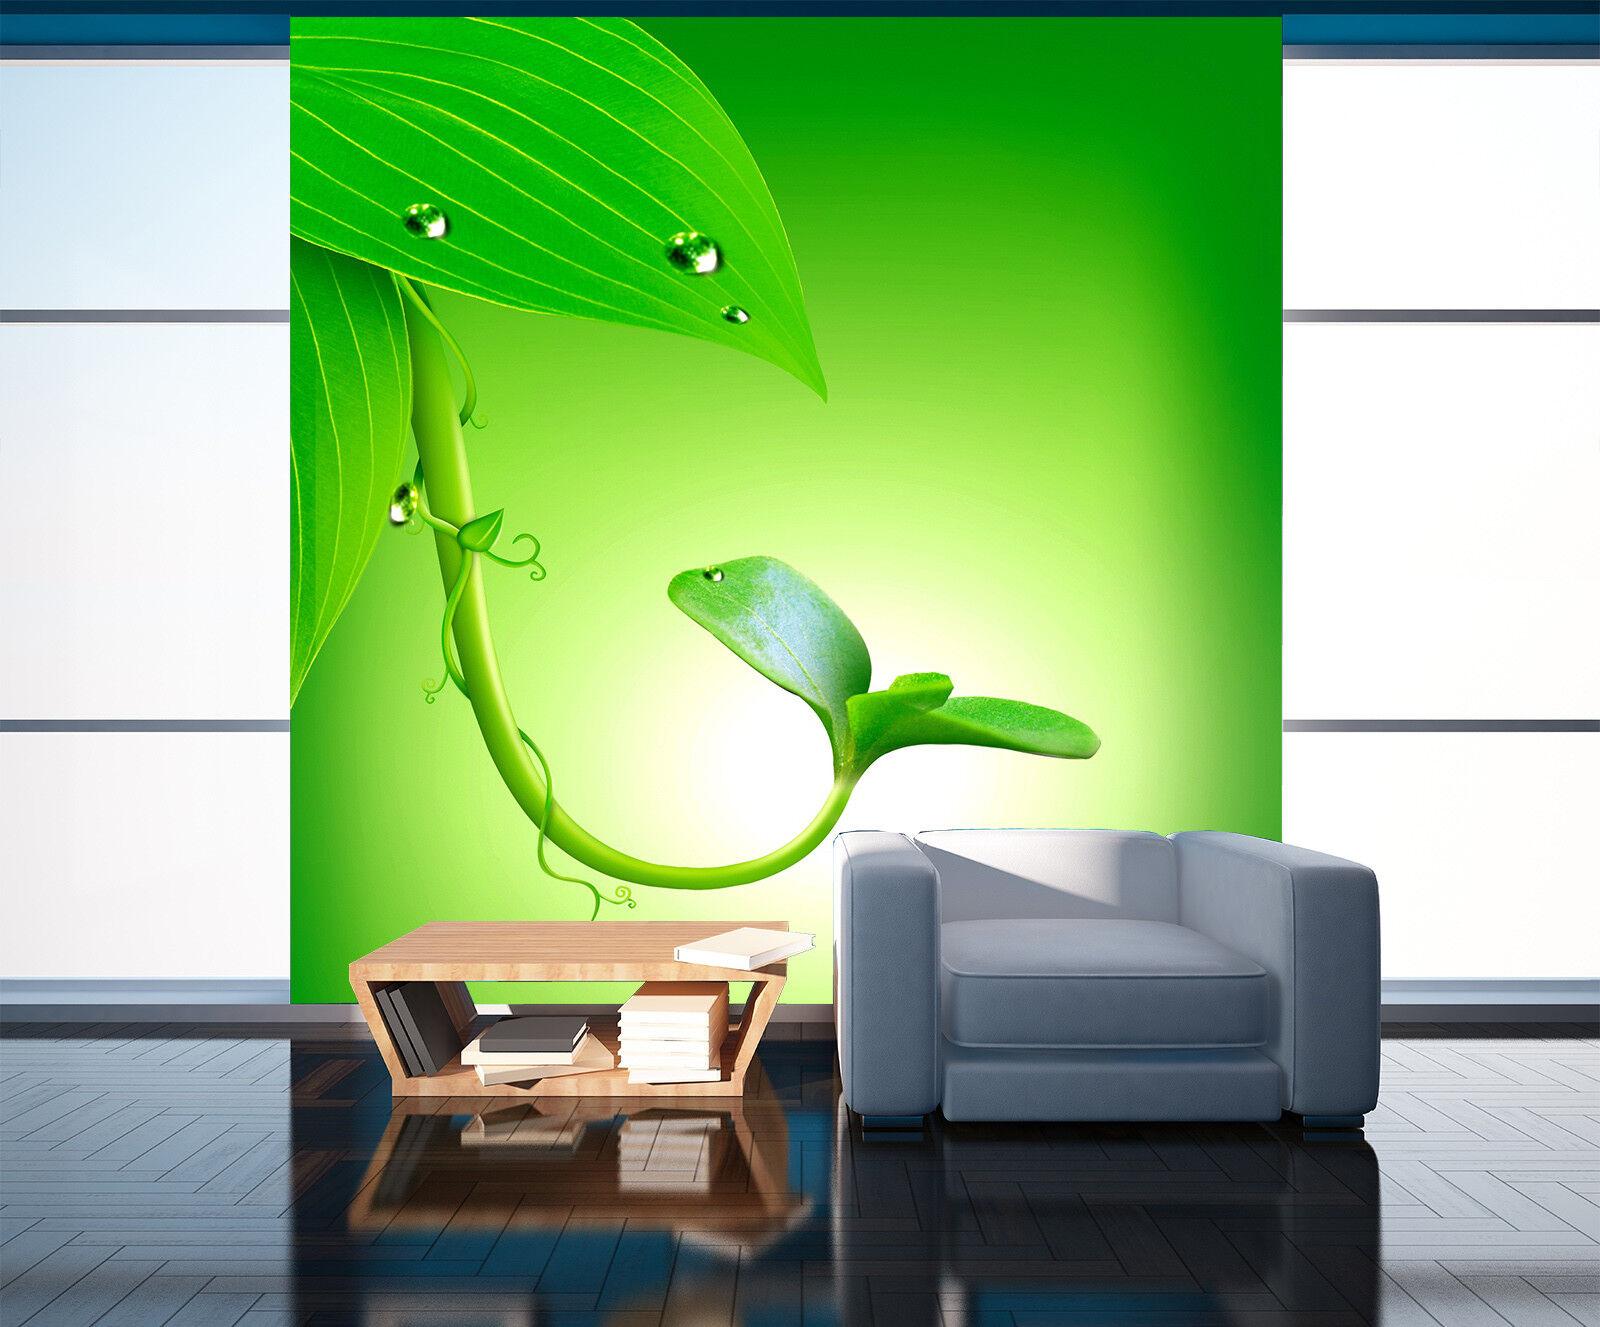 3D Sprout 56 Wallpaper Murals Wall Print Wallpaper Mural AJ WALLPAPER UK